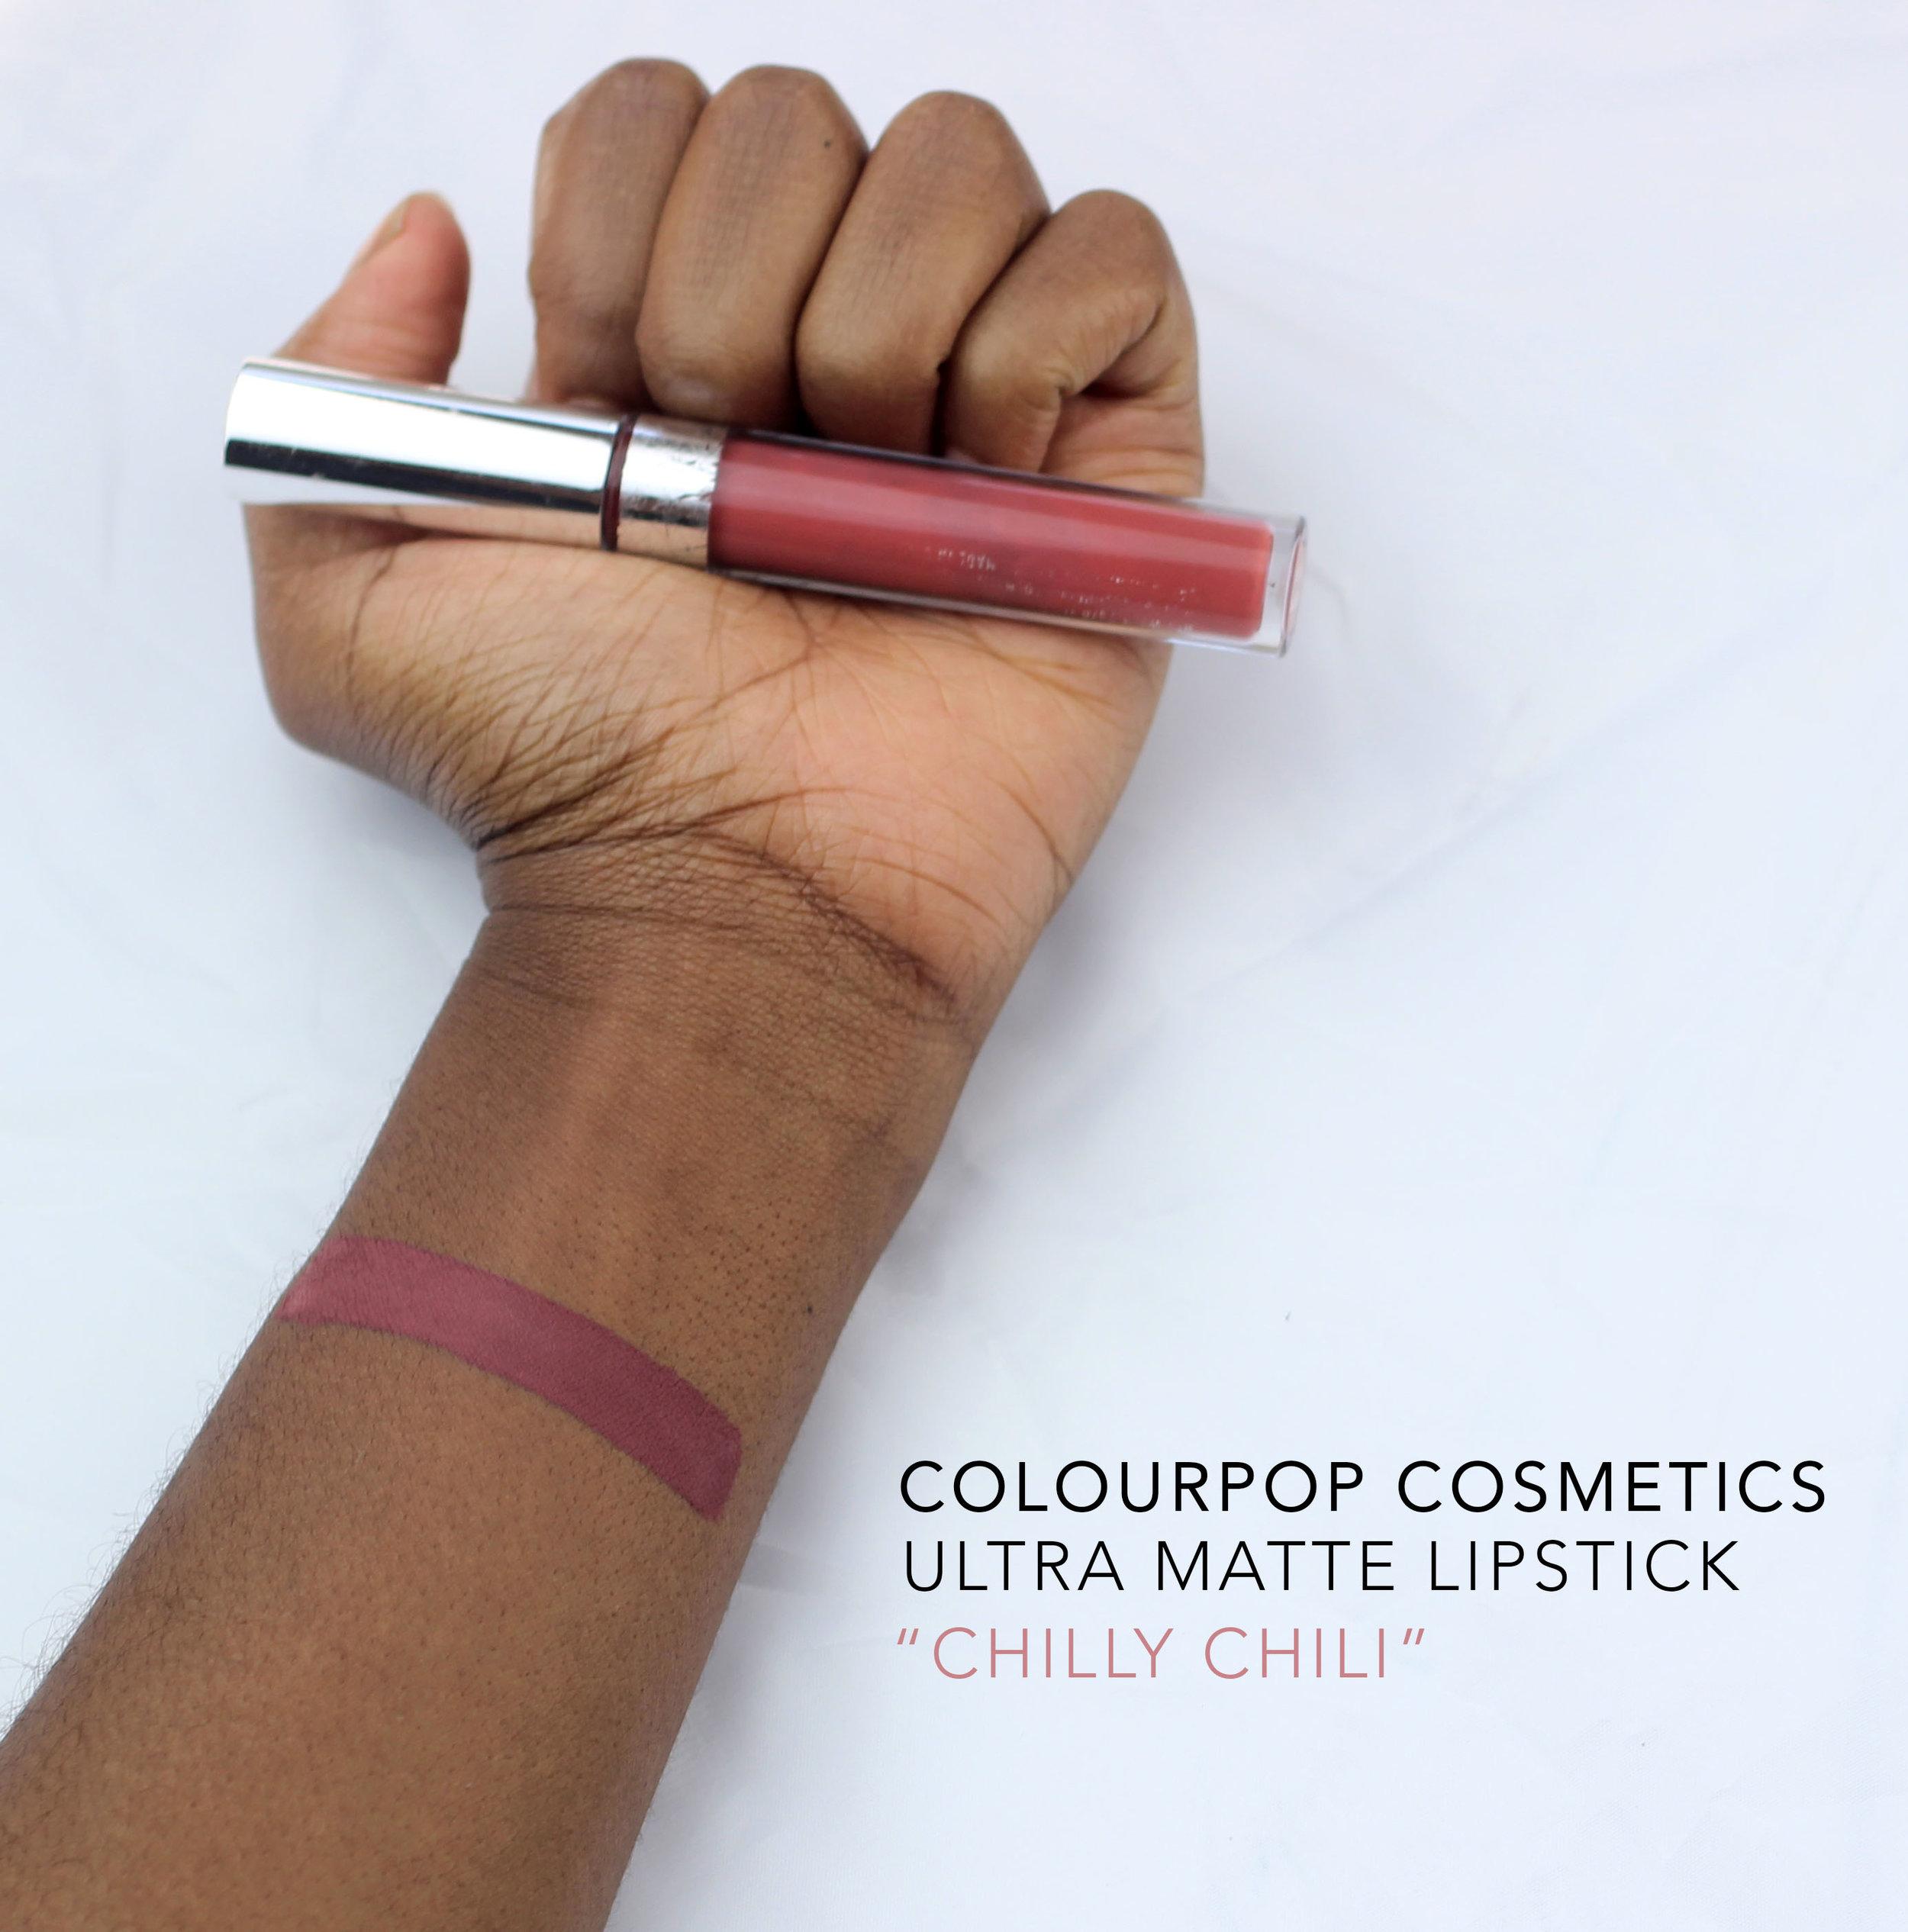 colourpop cosmetics chilly chili swatch dark skin